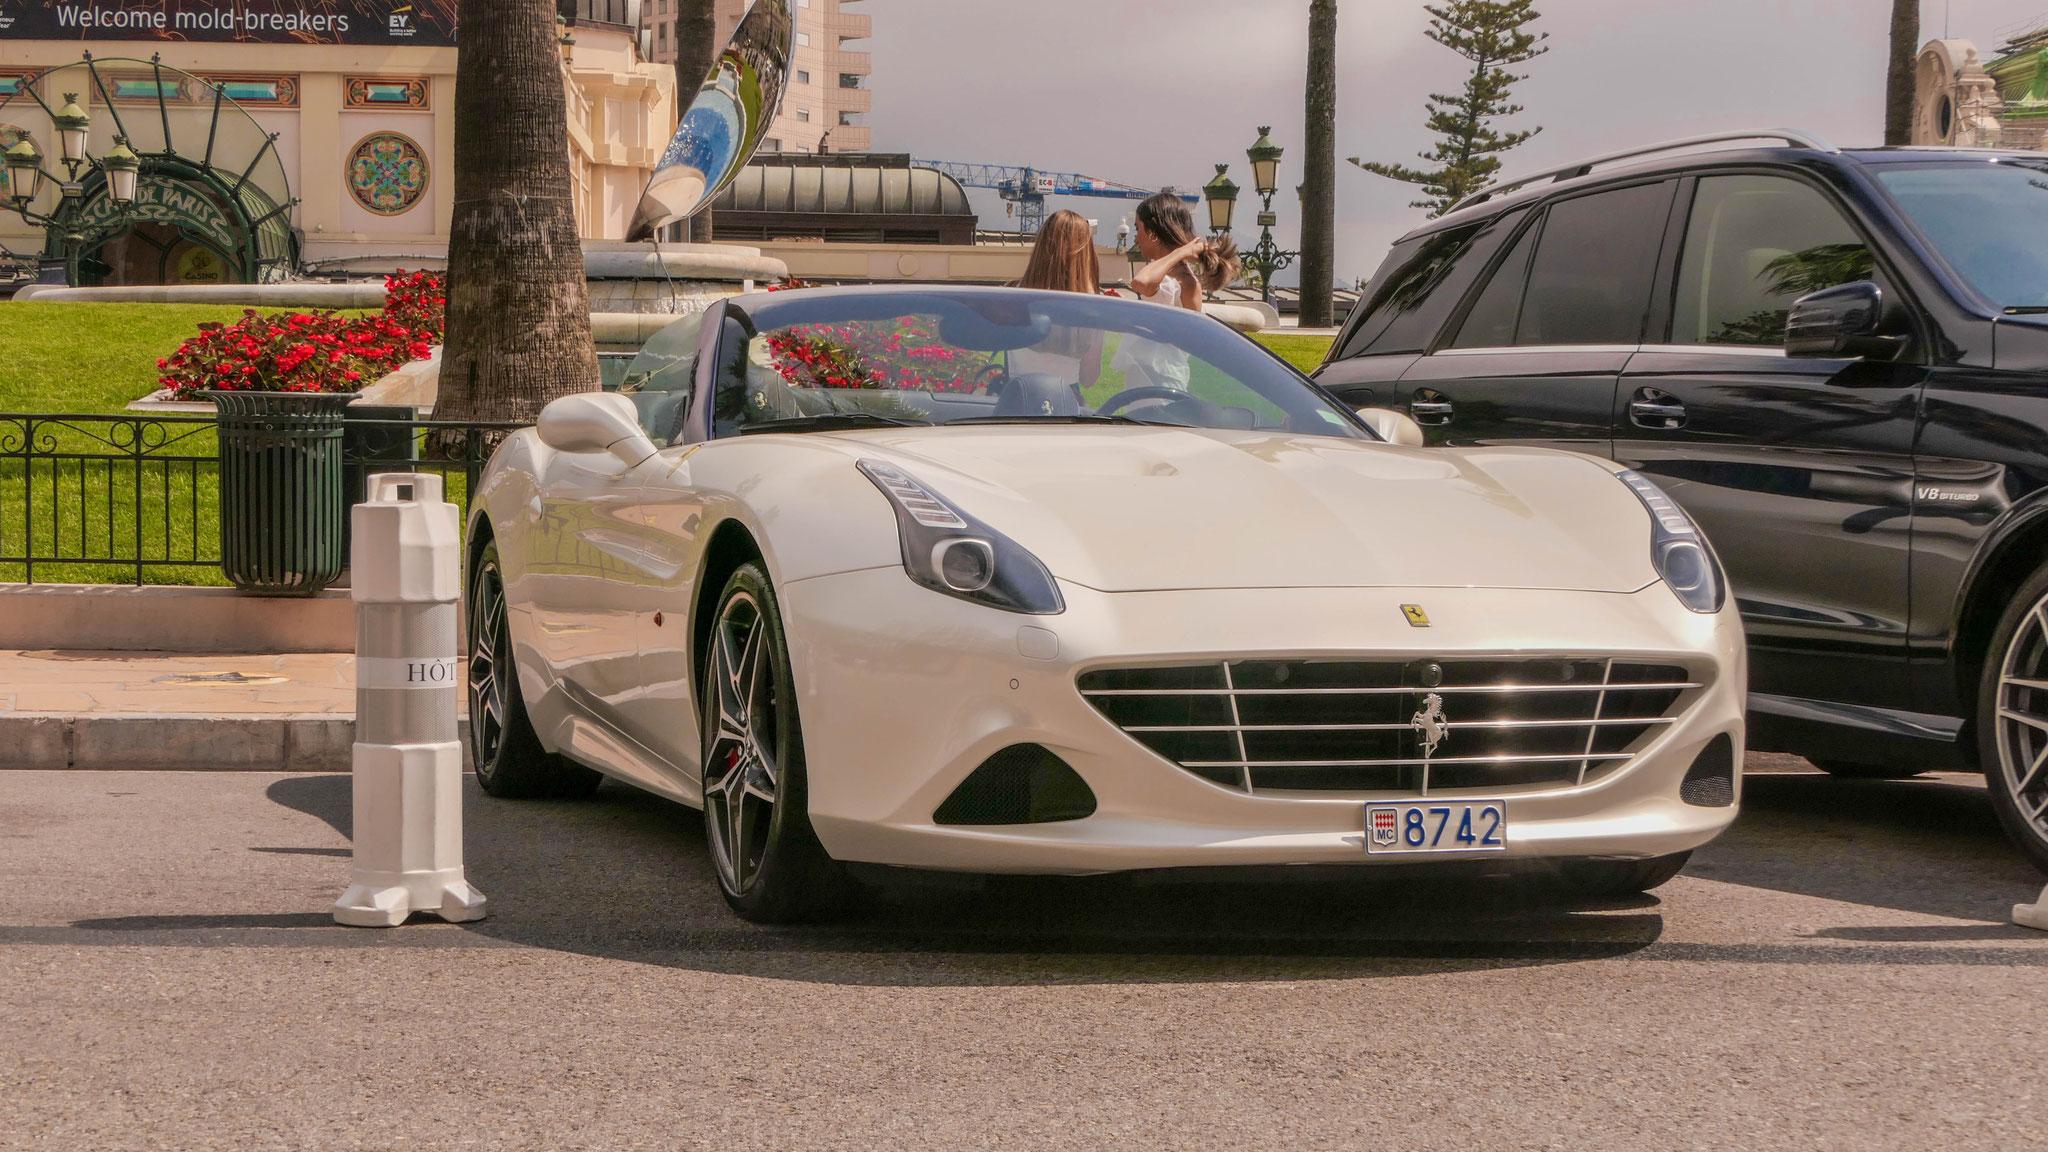 Ferrari California T - 8742 (MC)